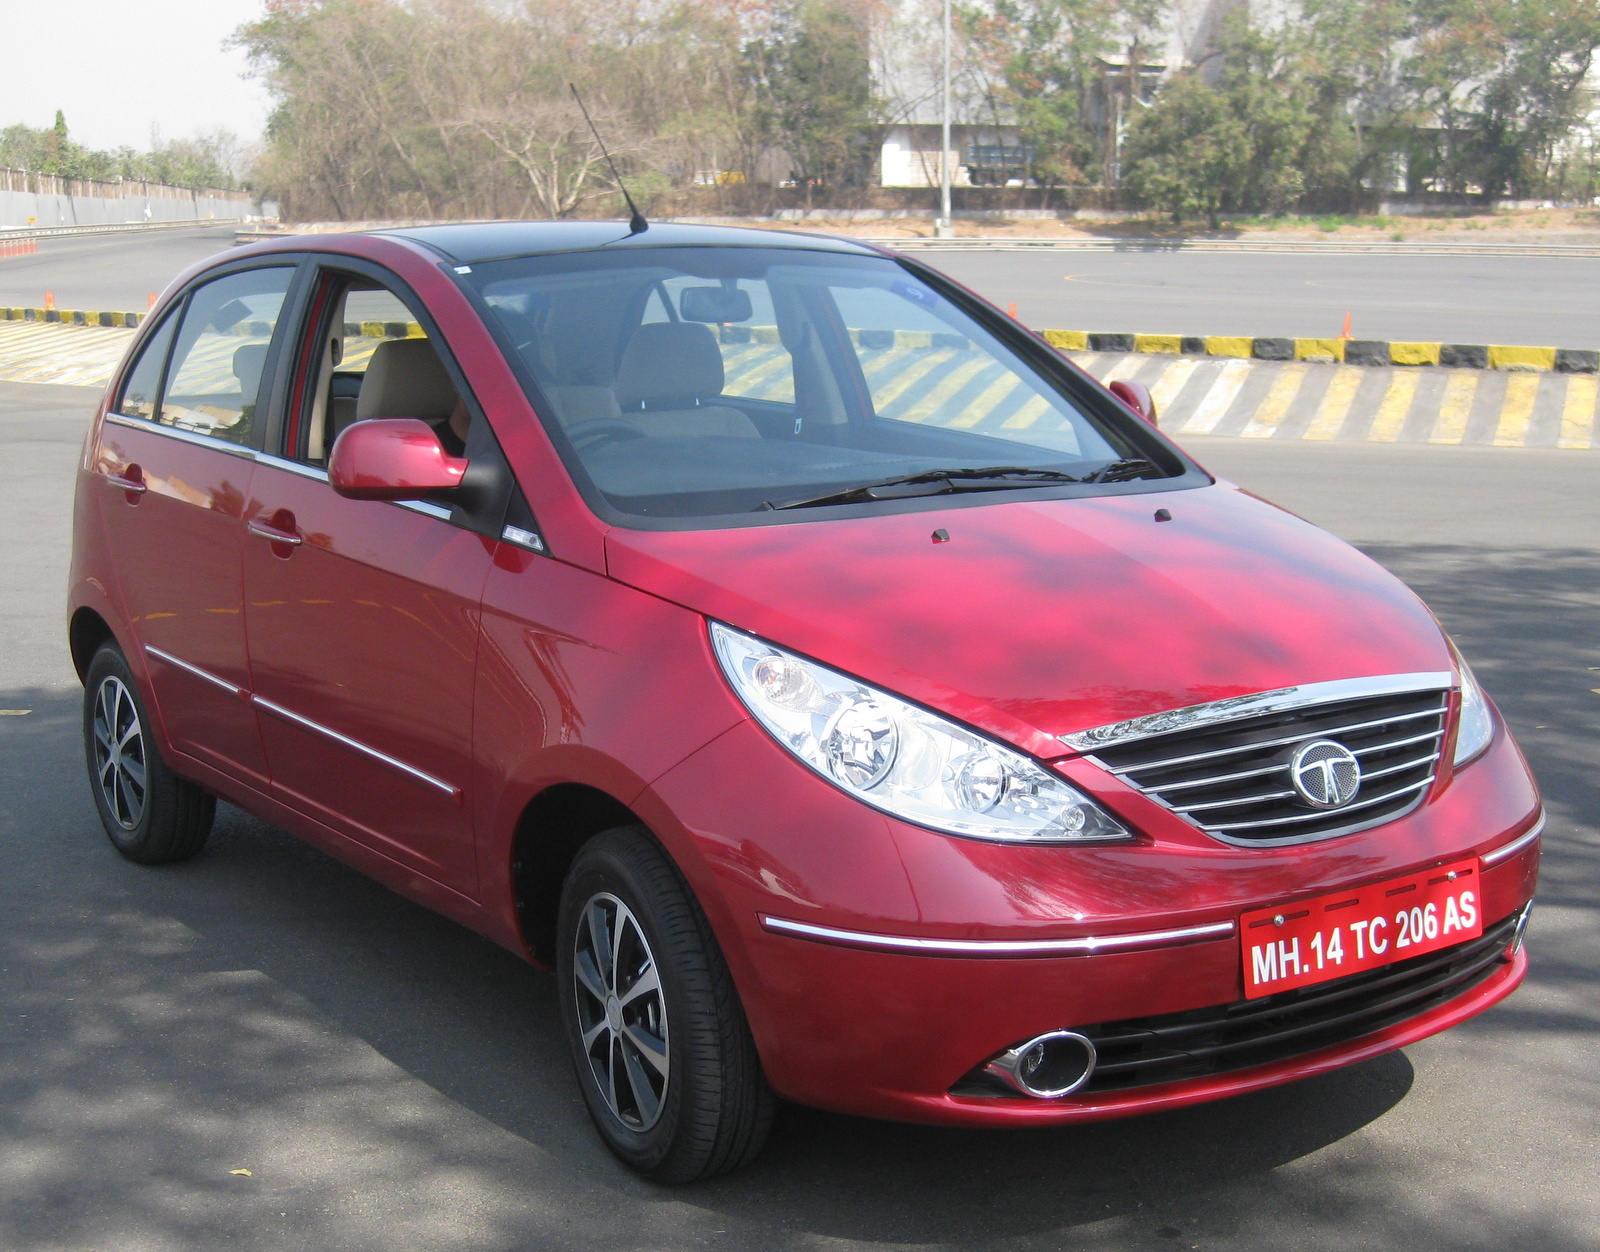 2013 Tata Indica